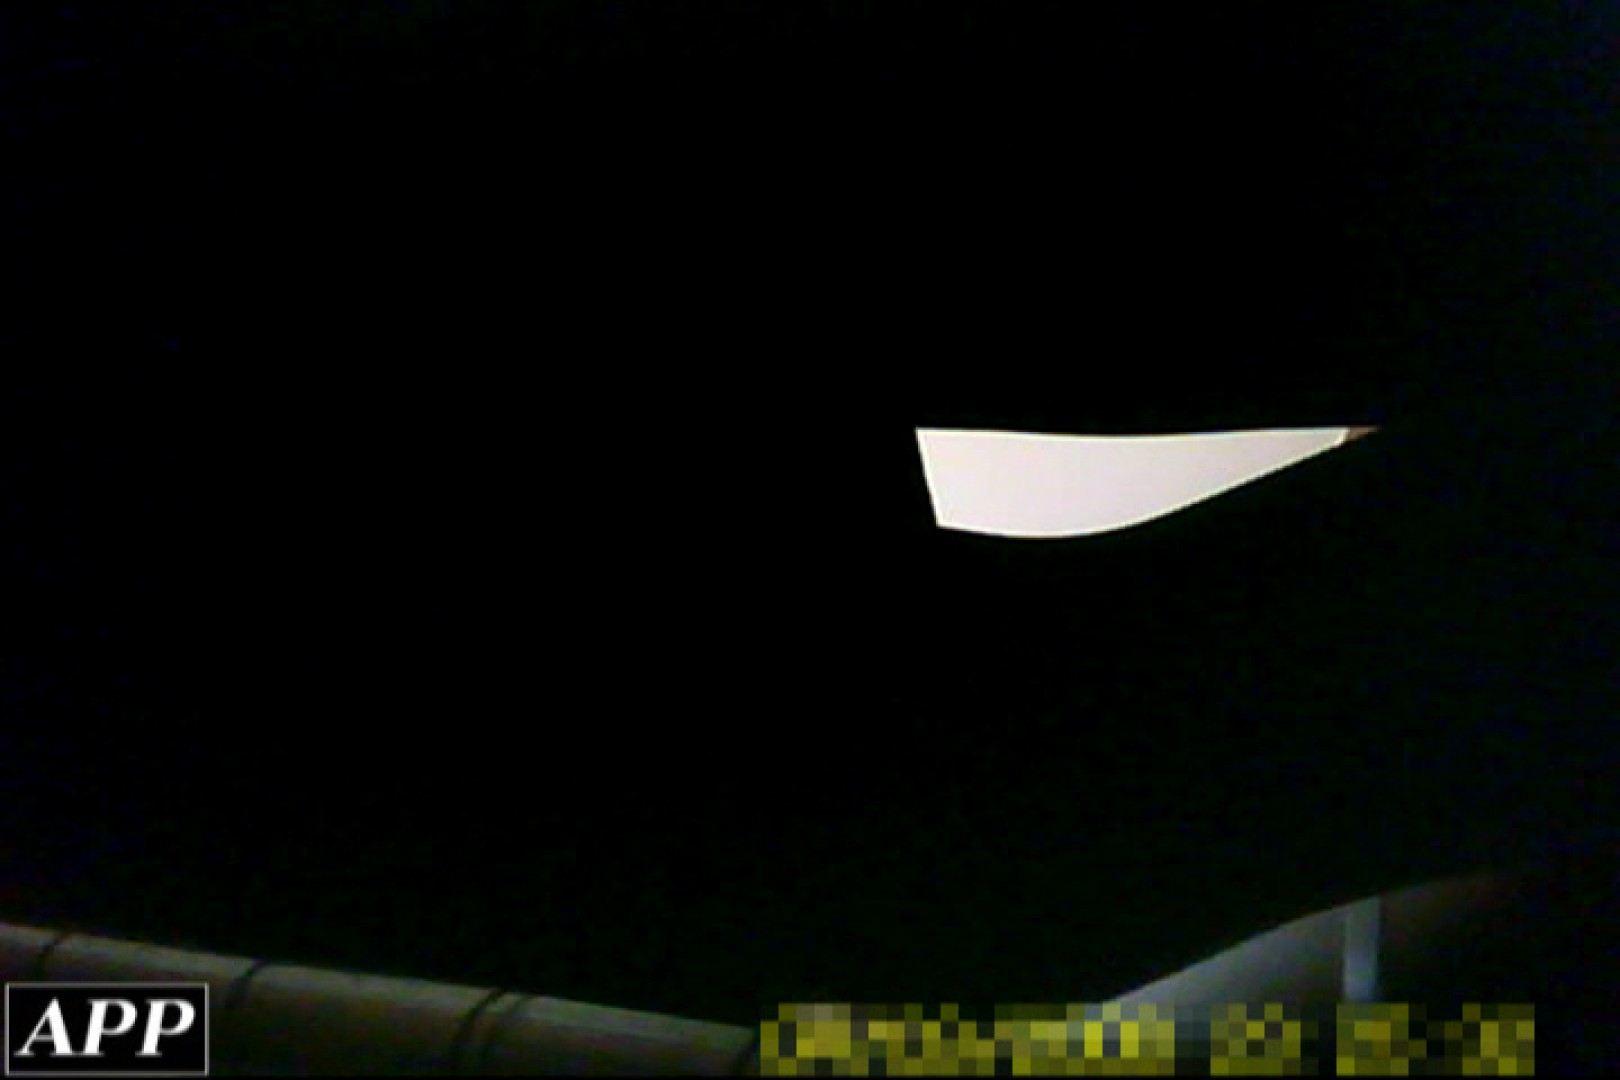 3視点洗面所 vol.051 OLセックス | 洗面所  105画像 83